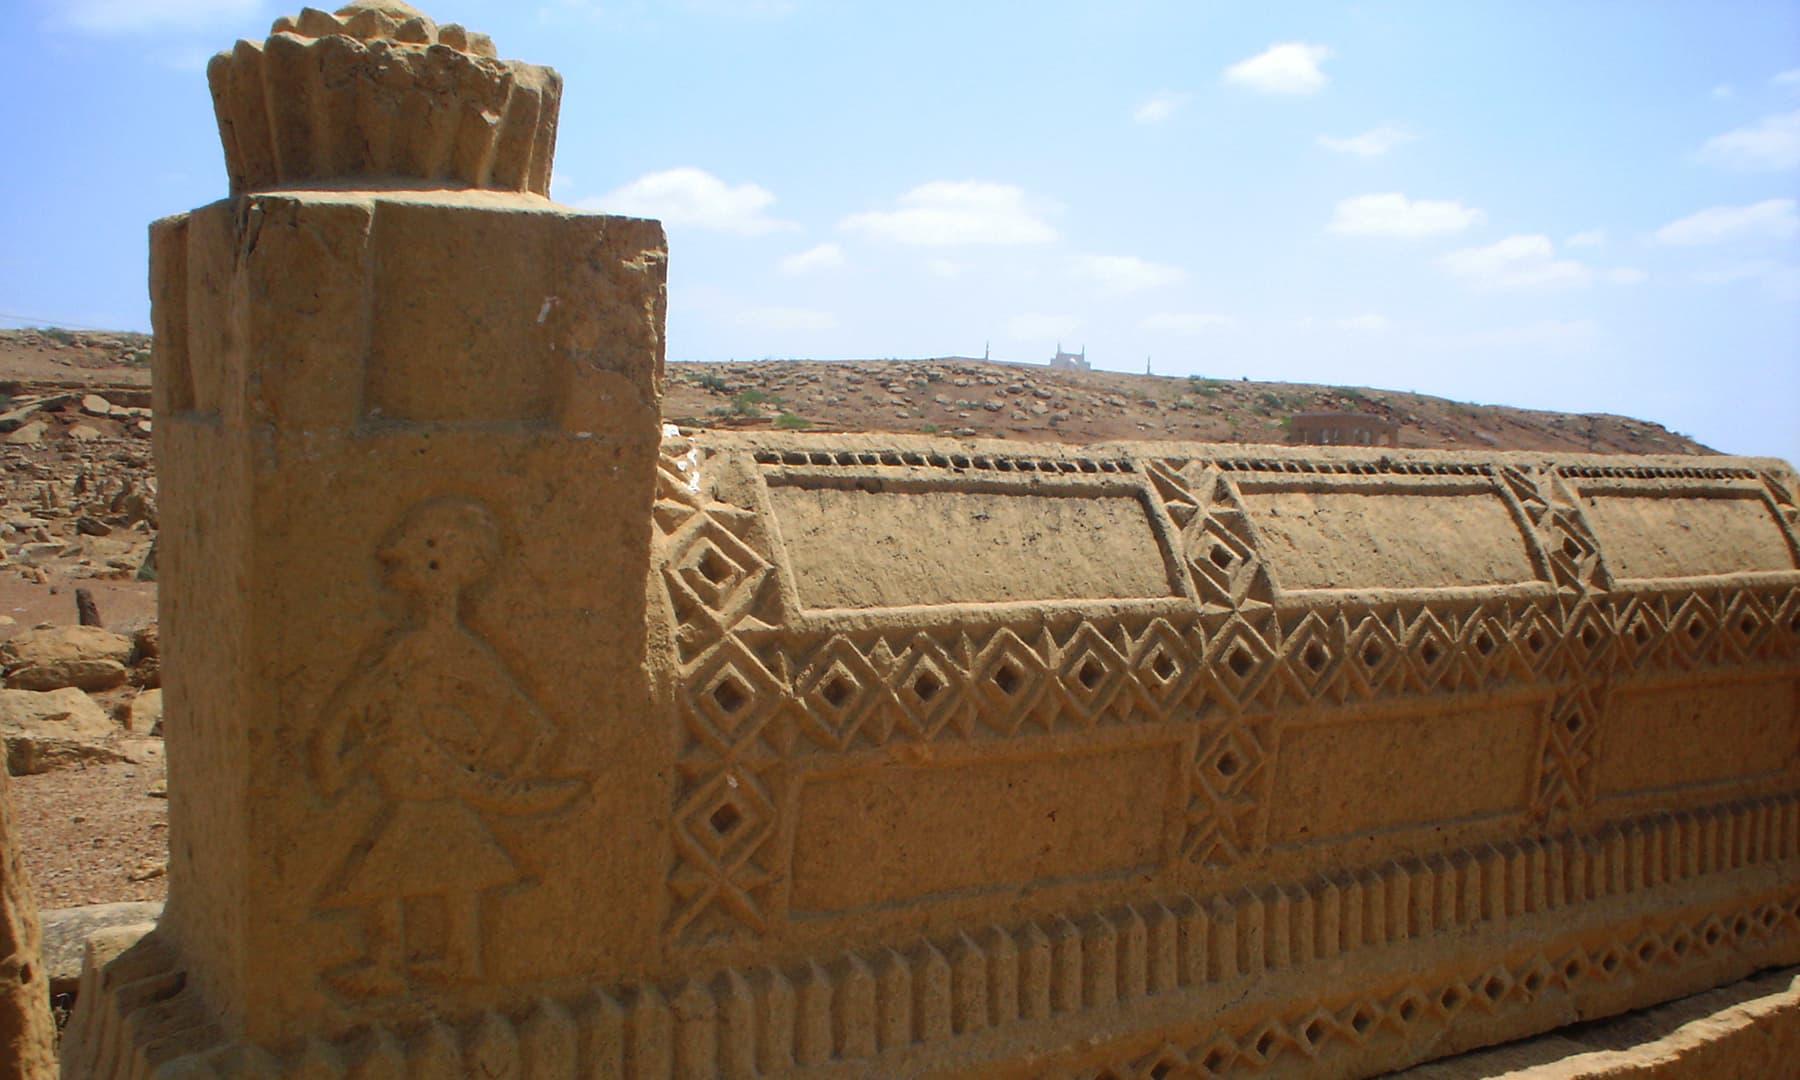 سونڈا کا قبرستان — تصویر ابوبکر شیخ